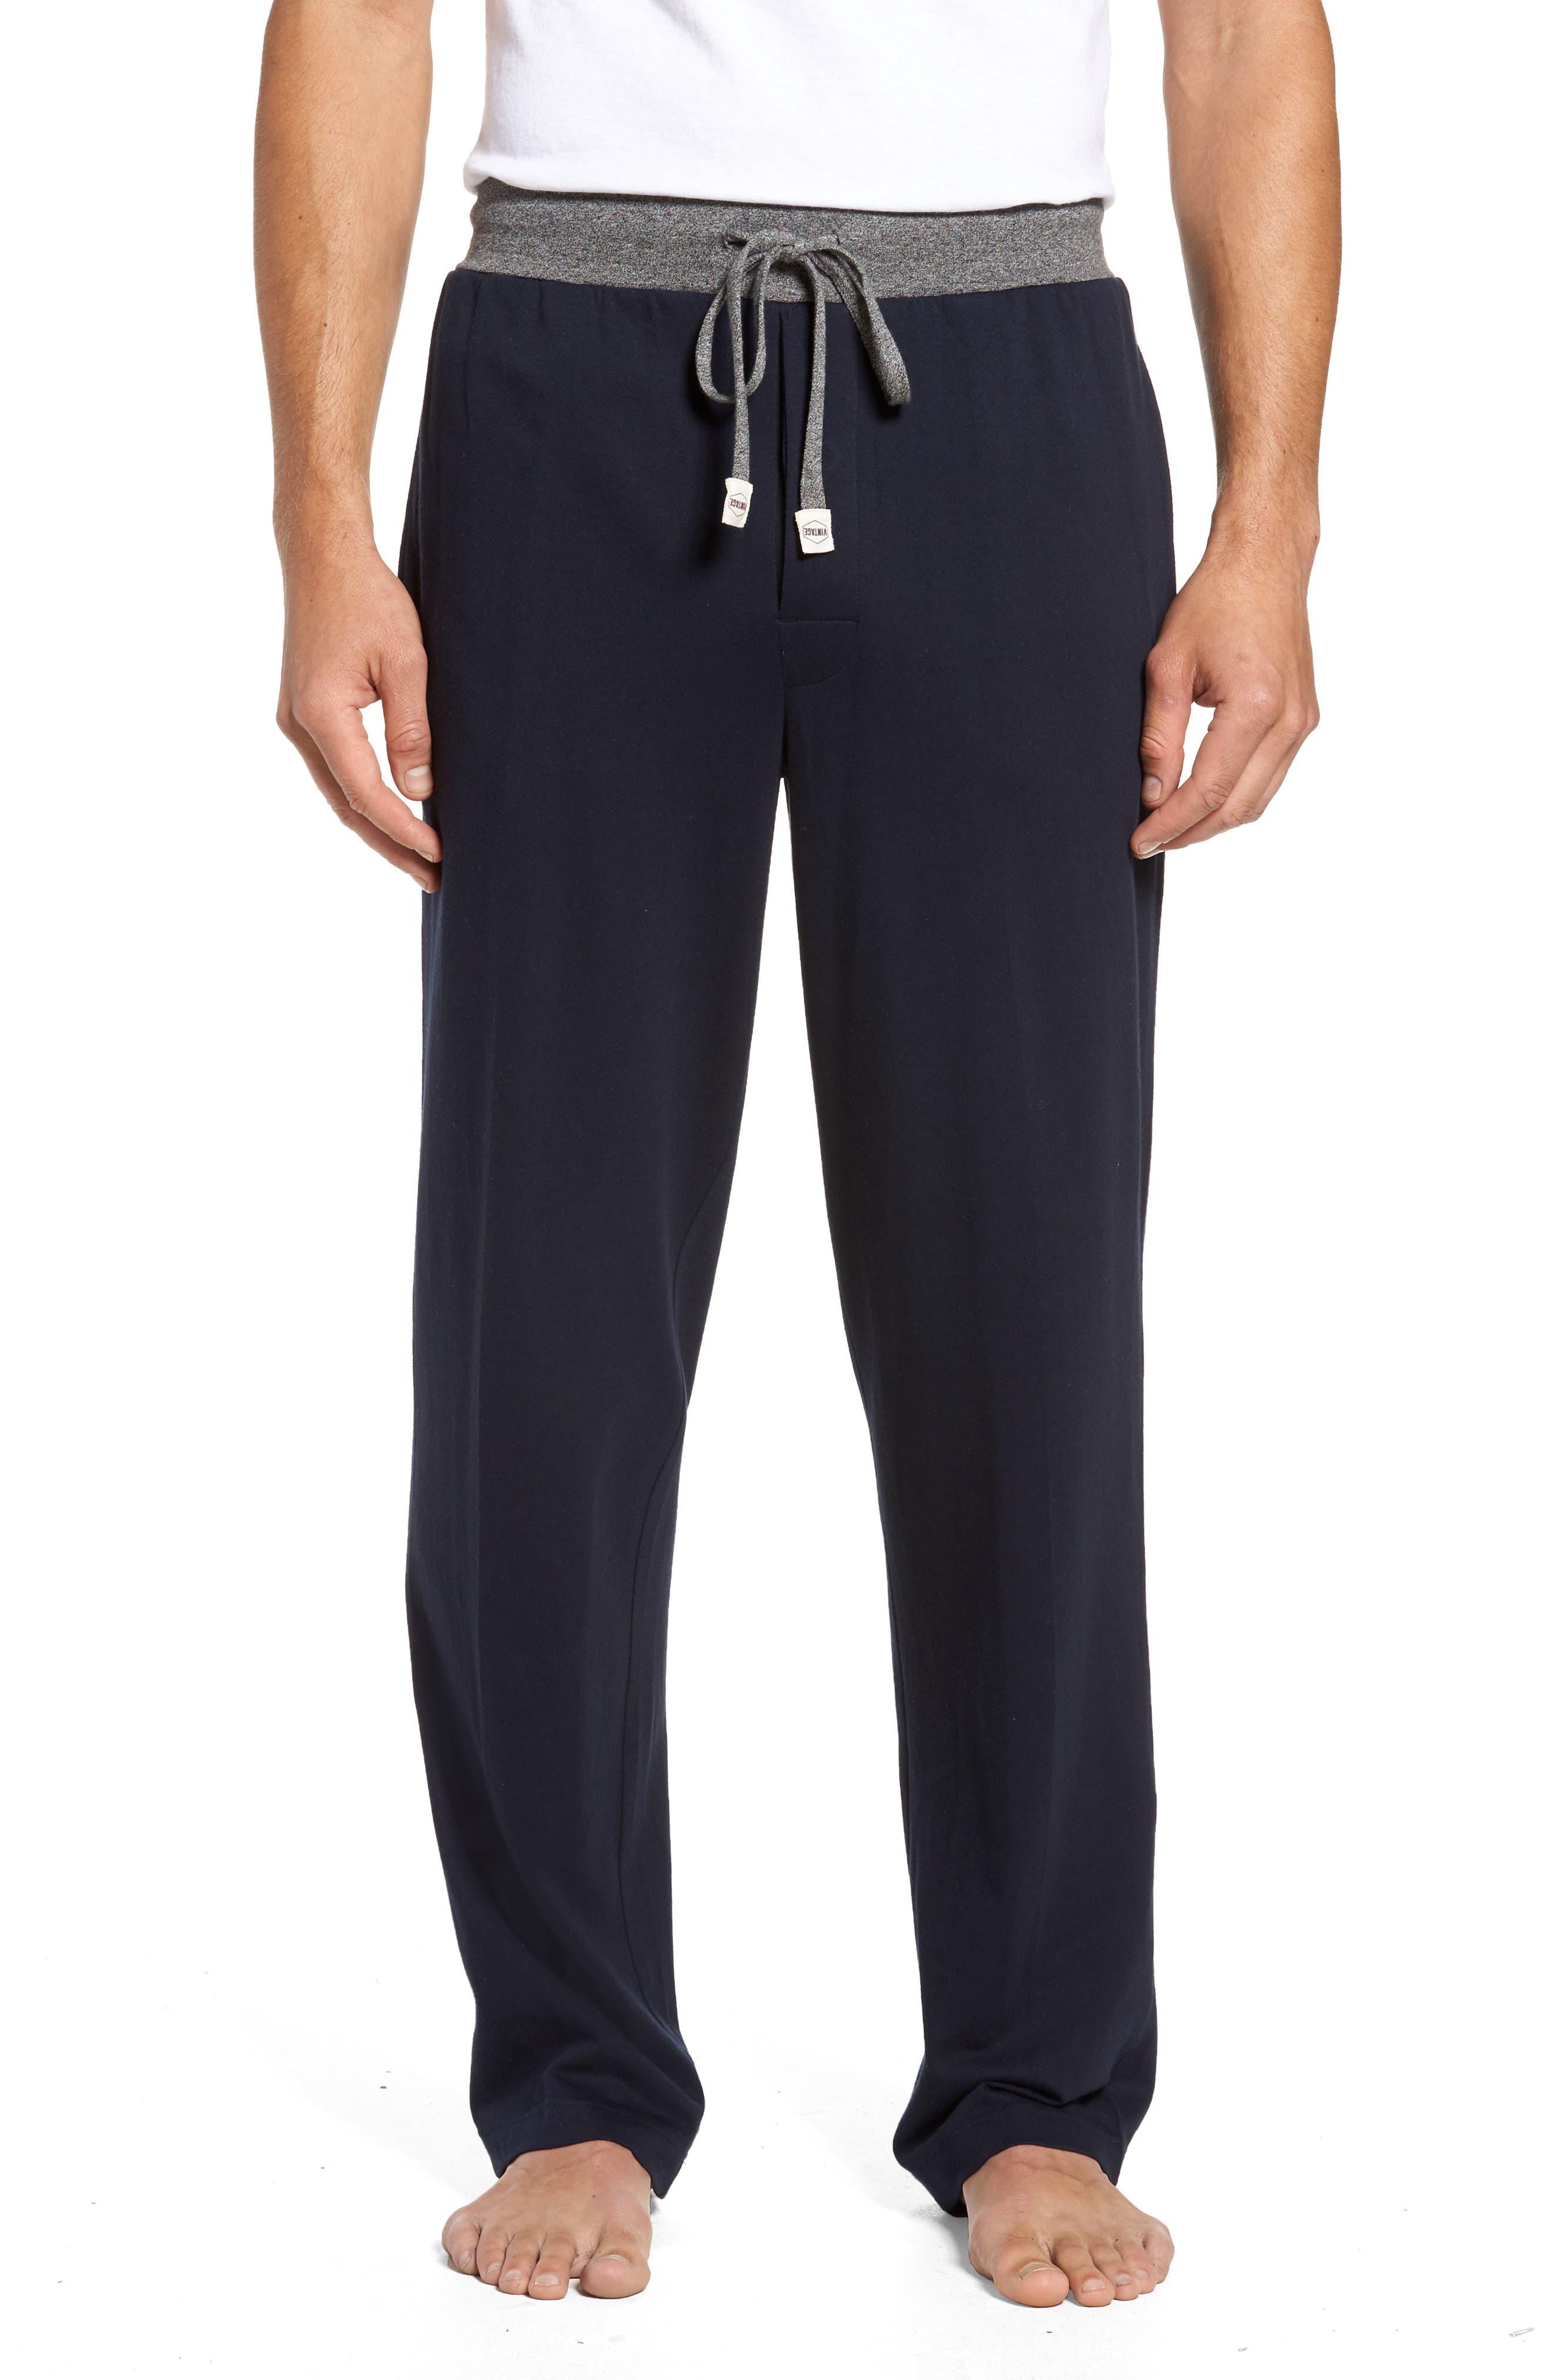 Trey Knit Lounge Pants,                             Main thumbnail 1, color,                             400